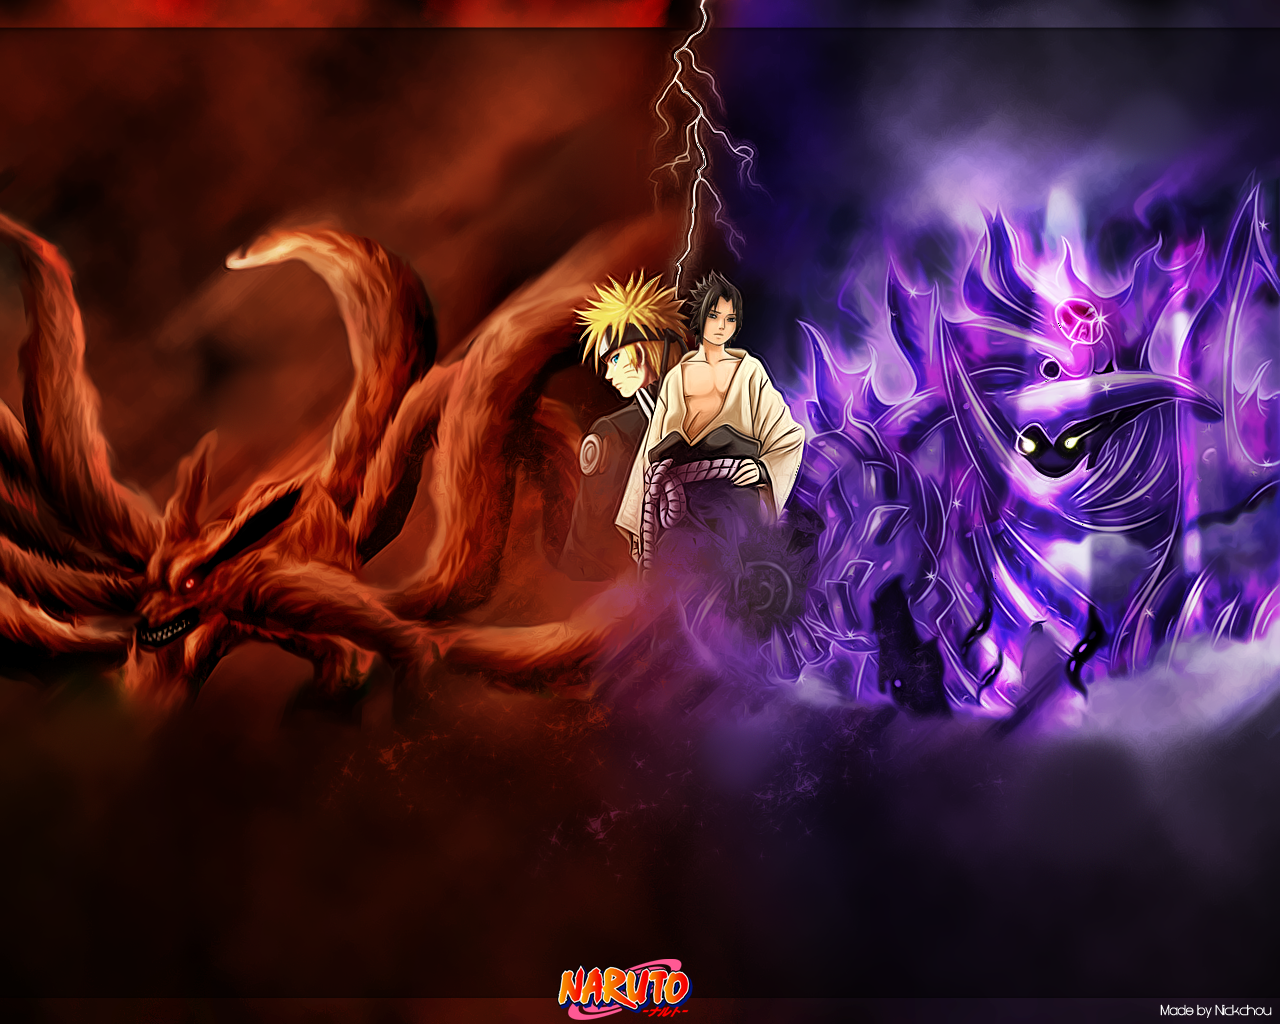 Naruto wallpaper by NickchouBG on deviantART 1280x1024